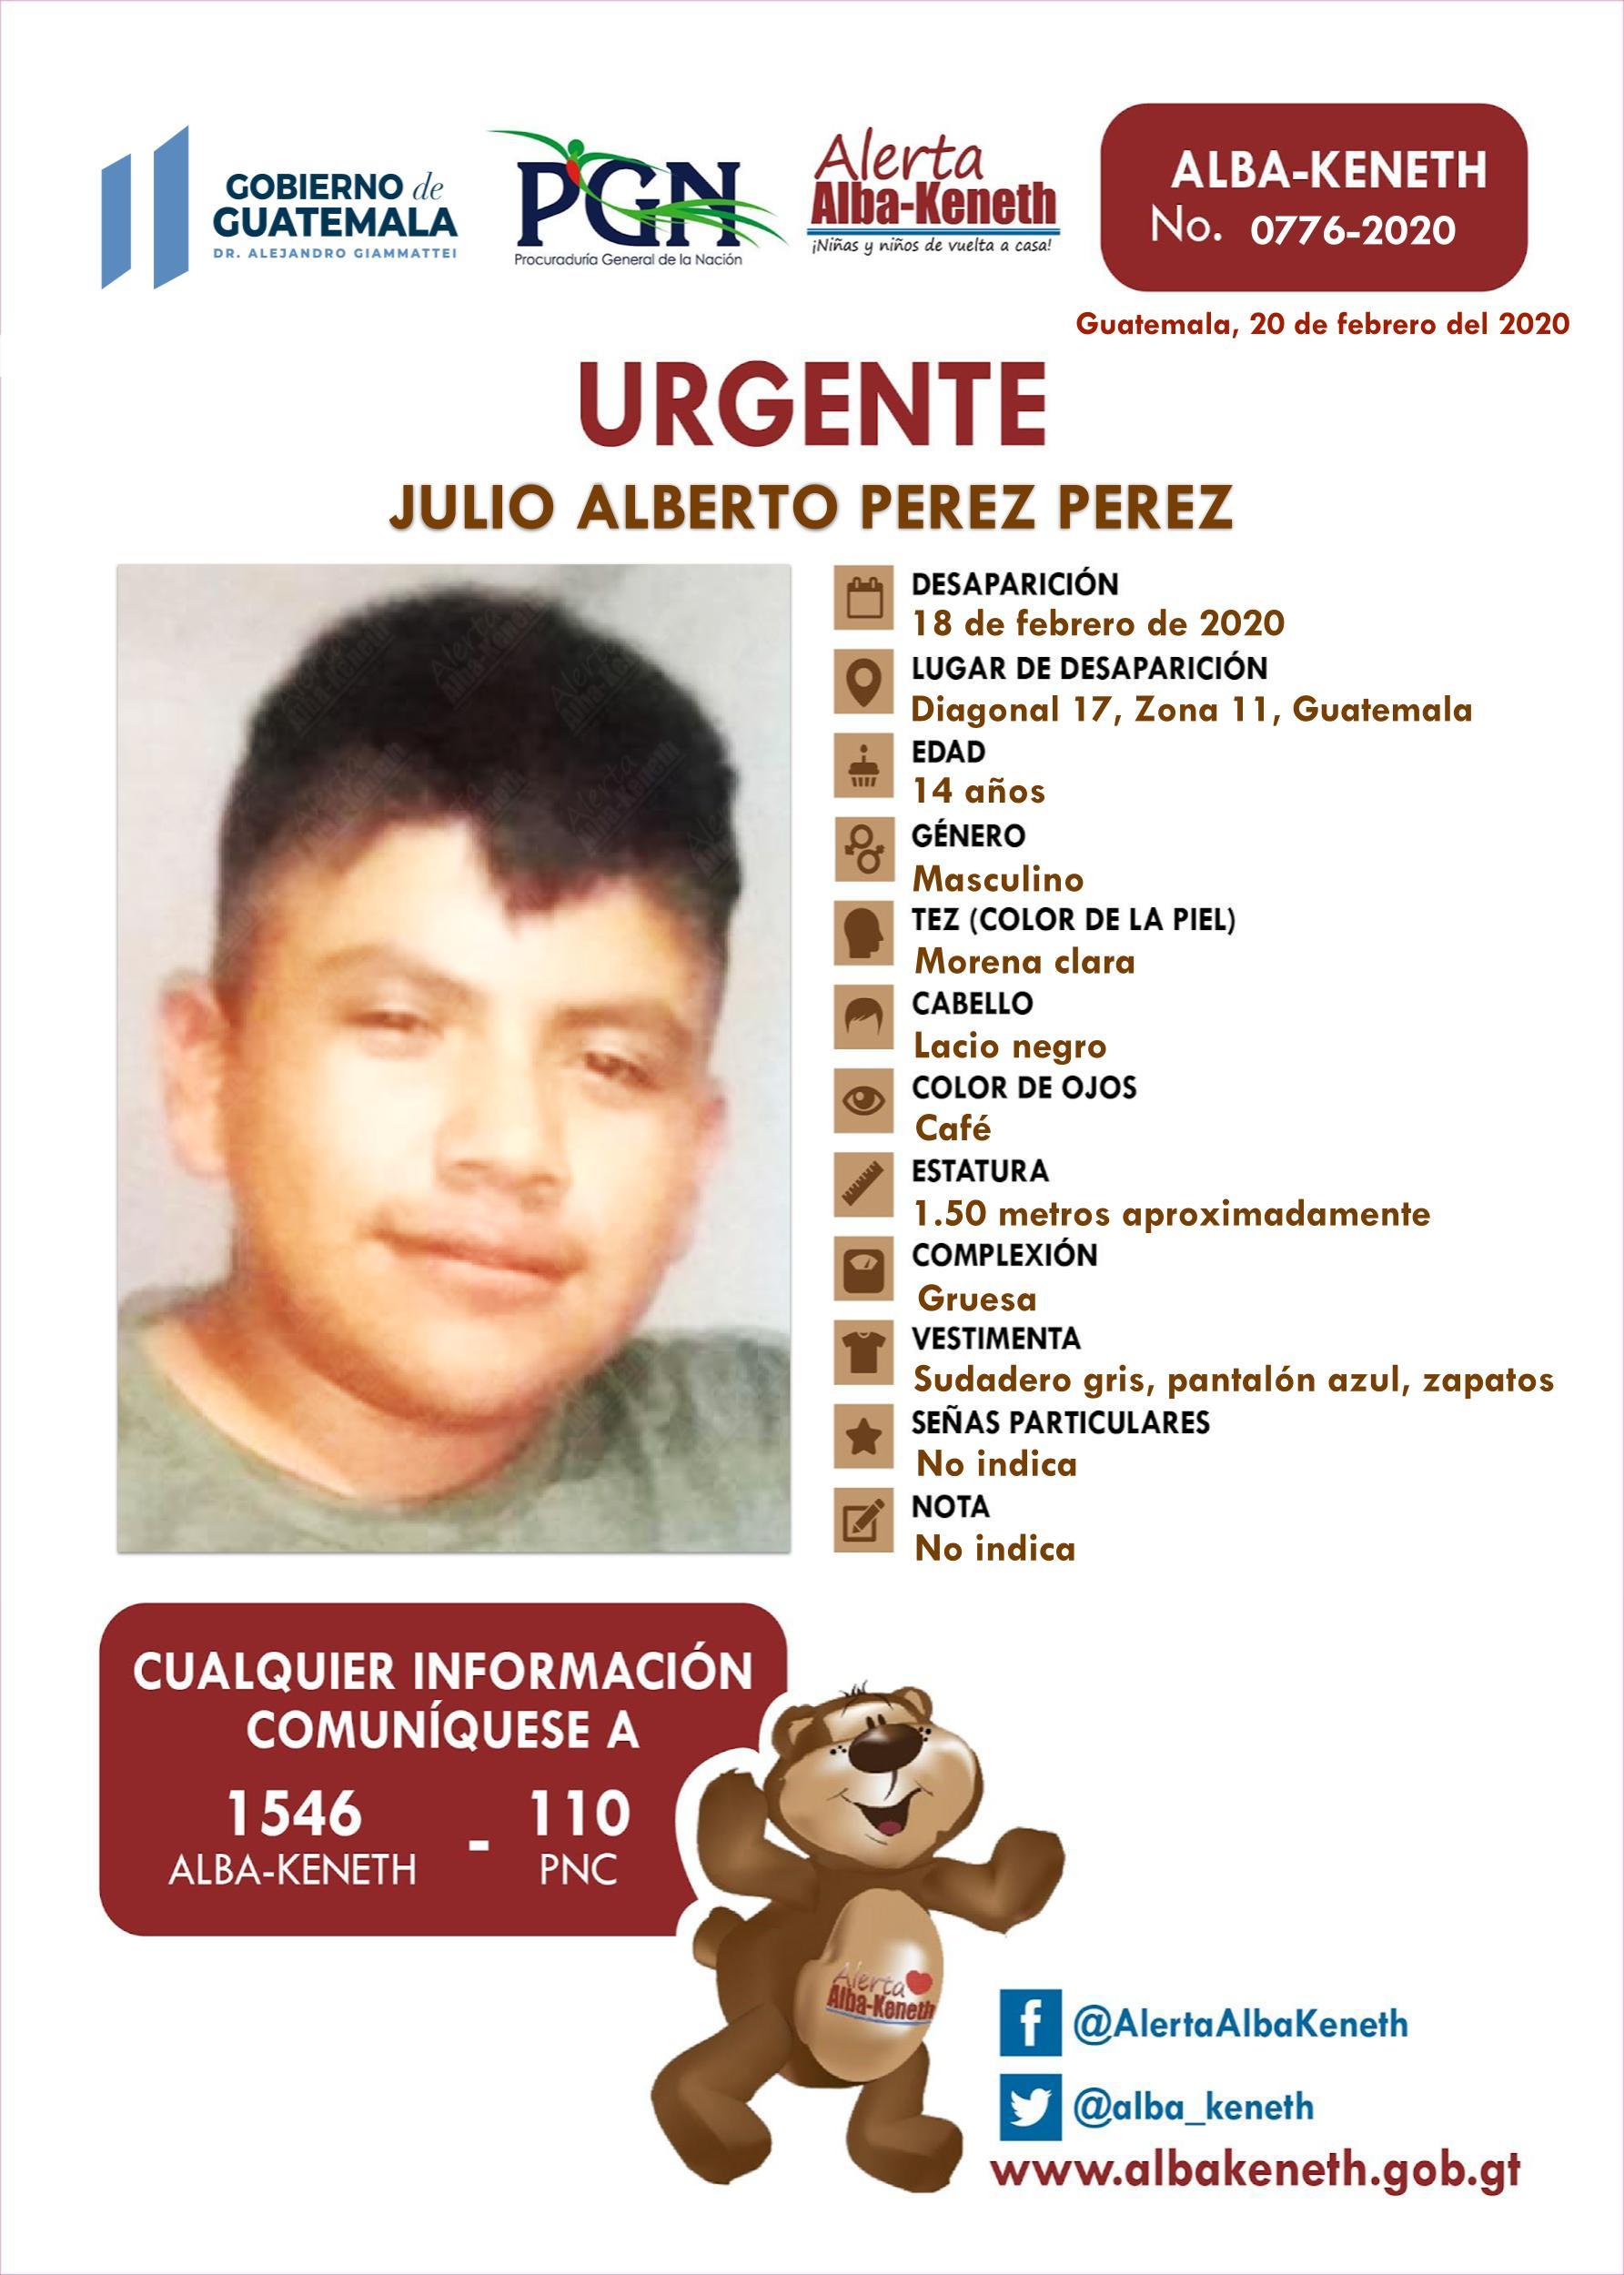 Julio Alberto Perez Perez